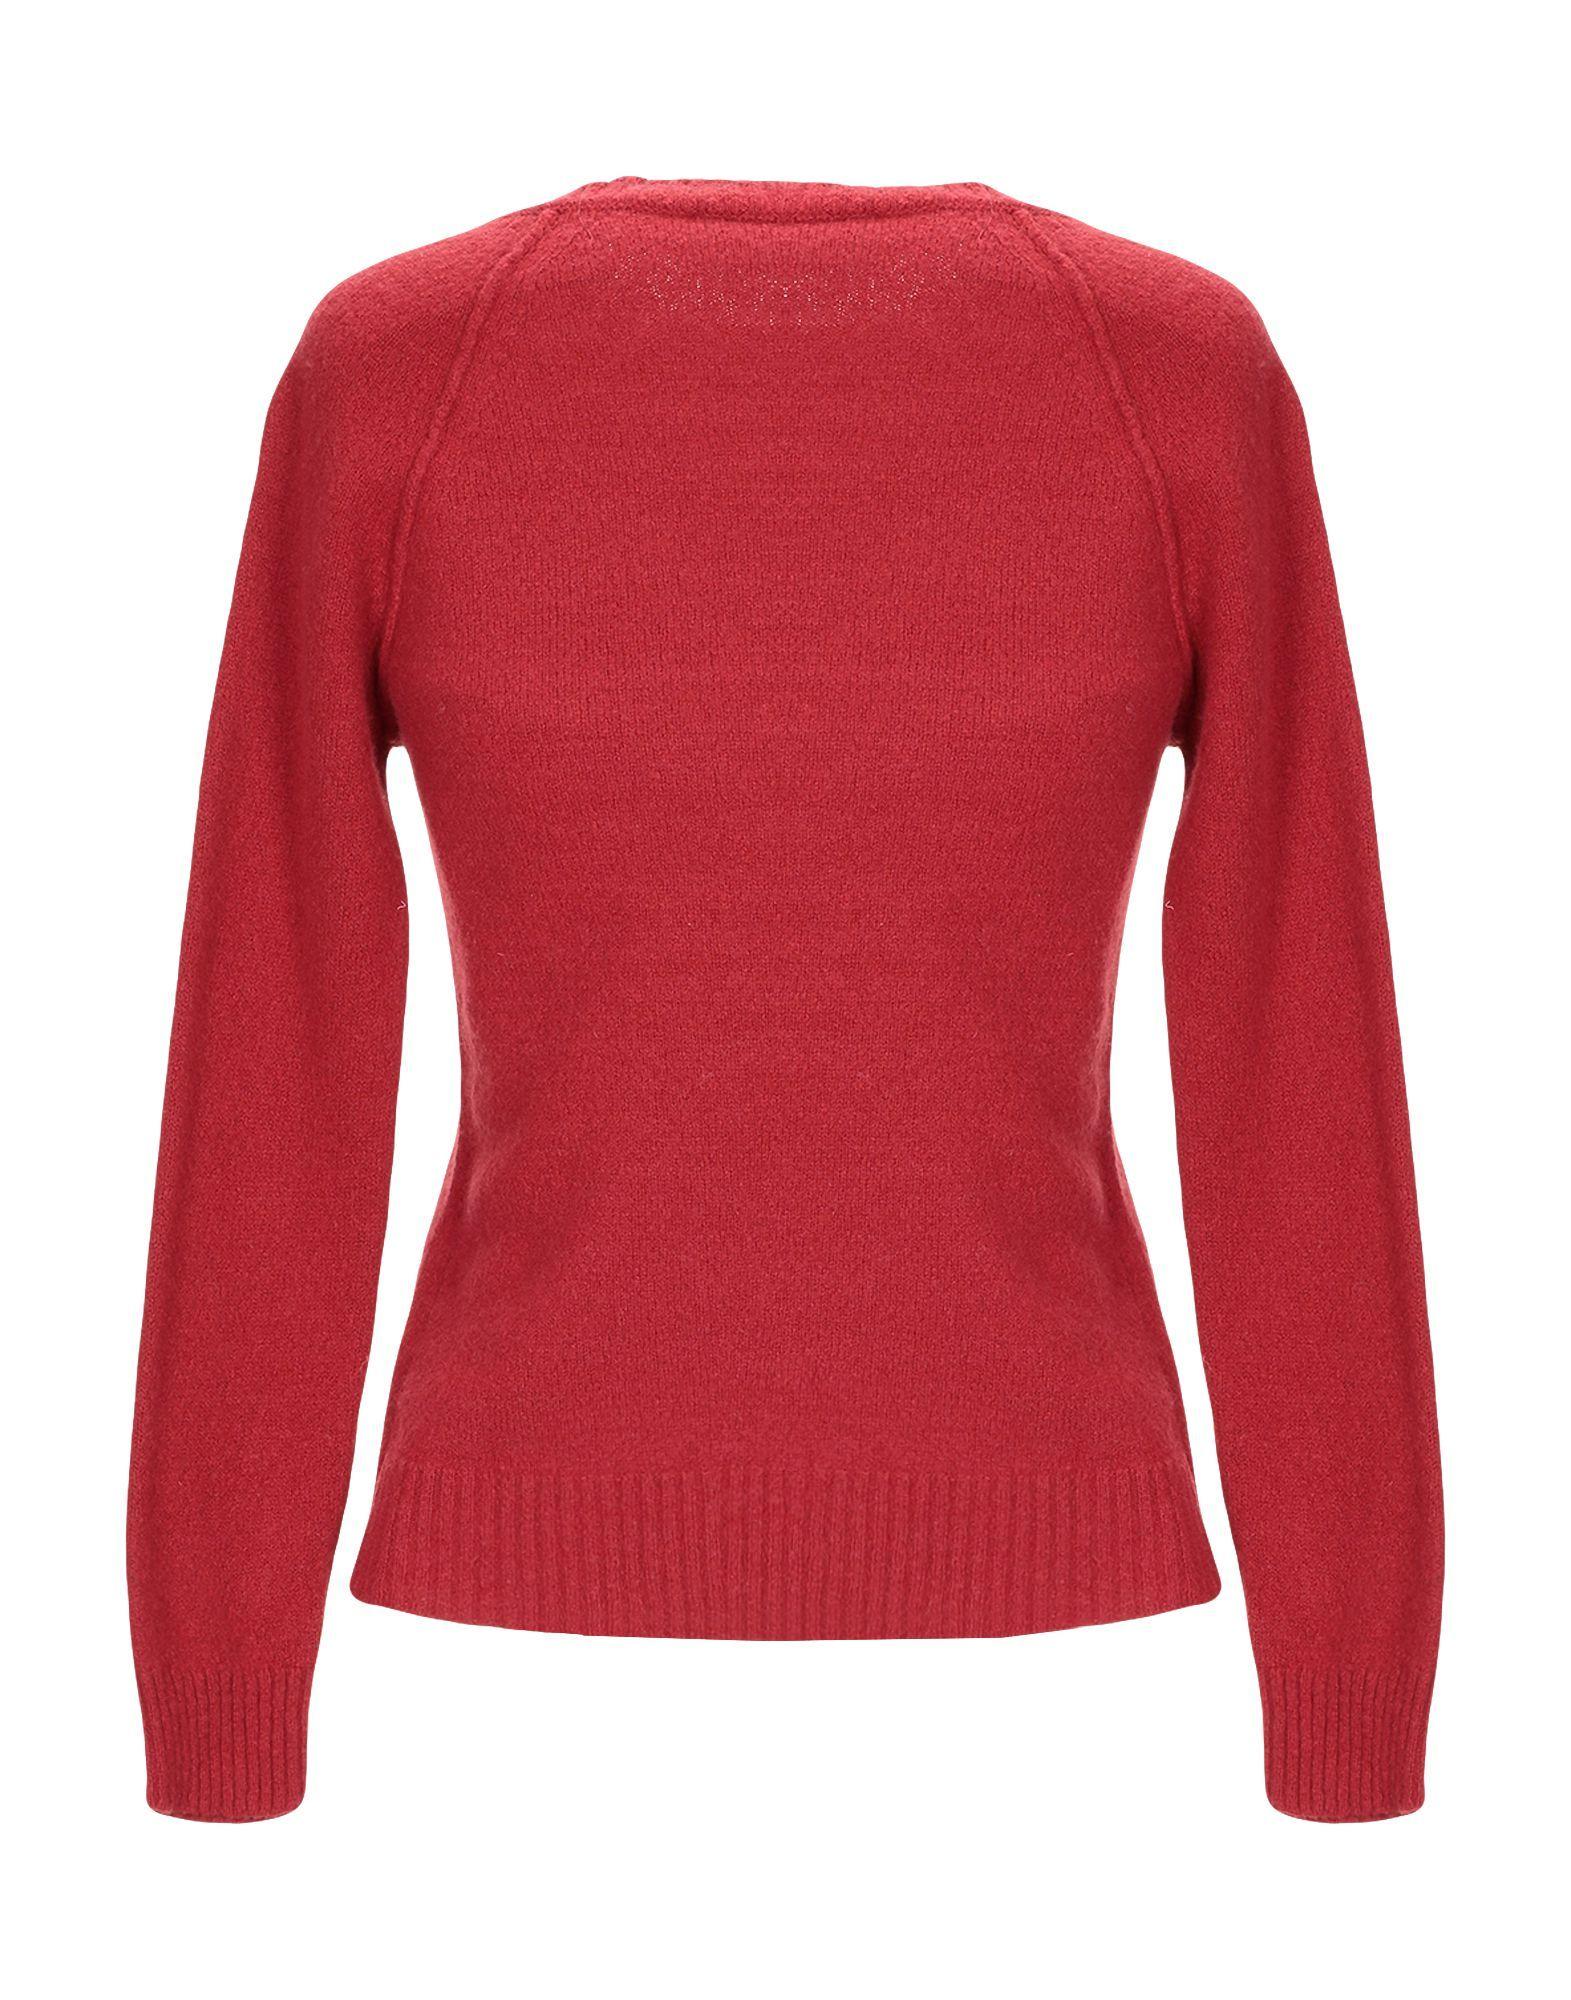 Jucca Brick Red Wool Jumper